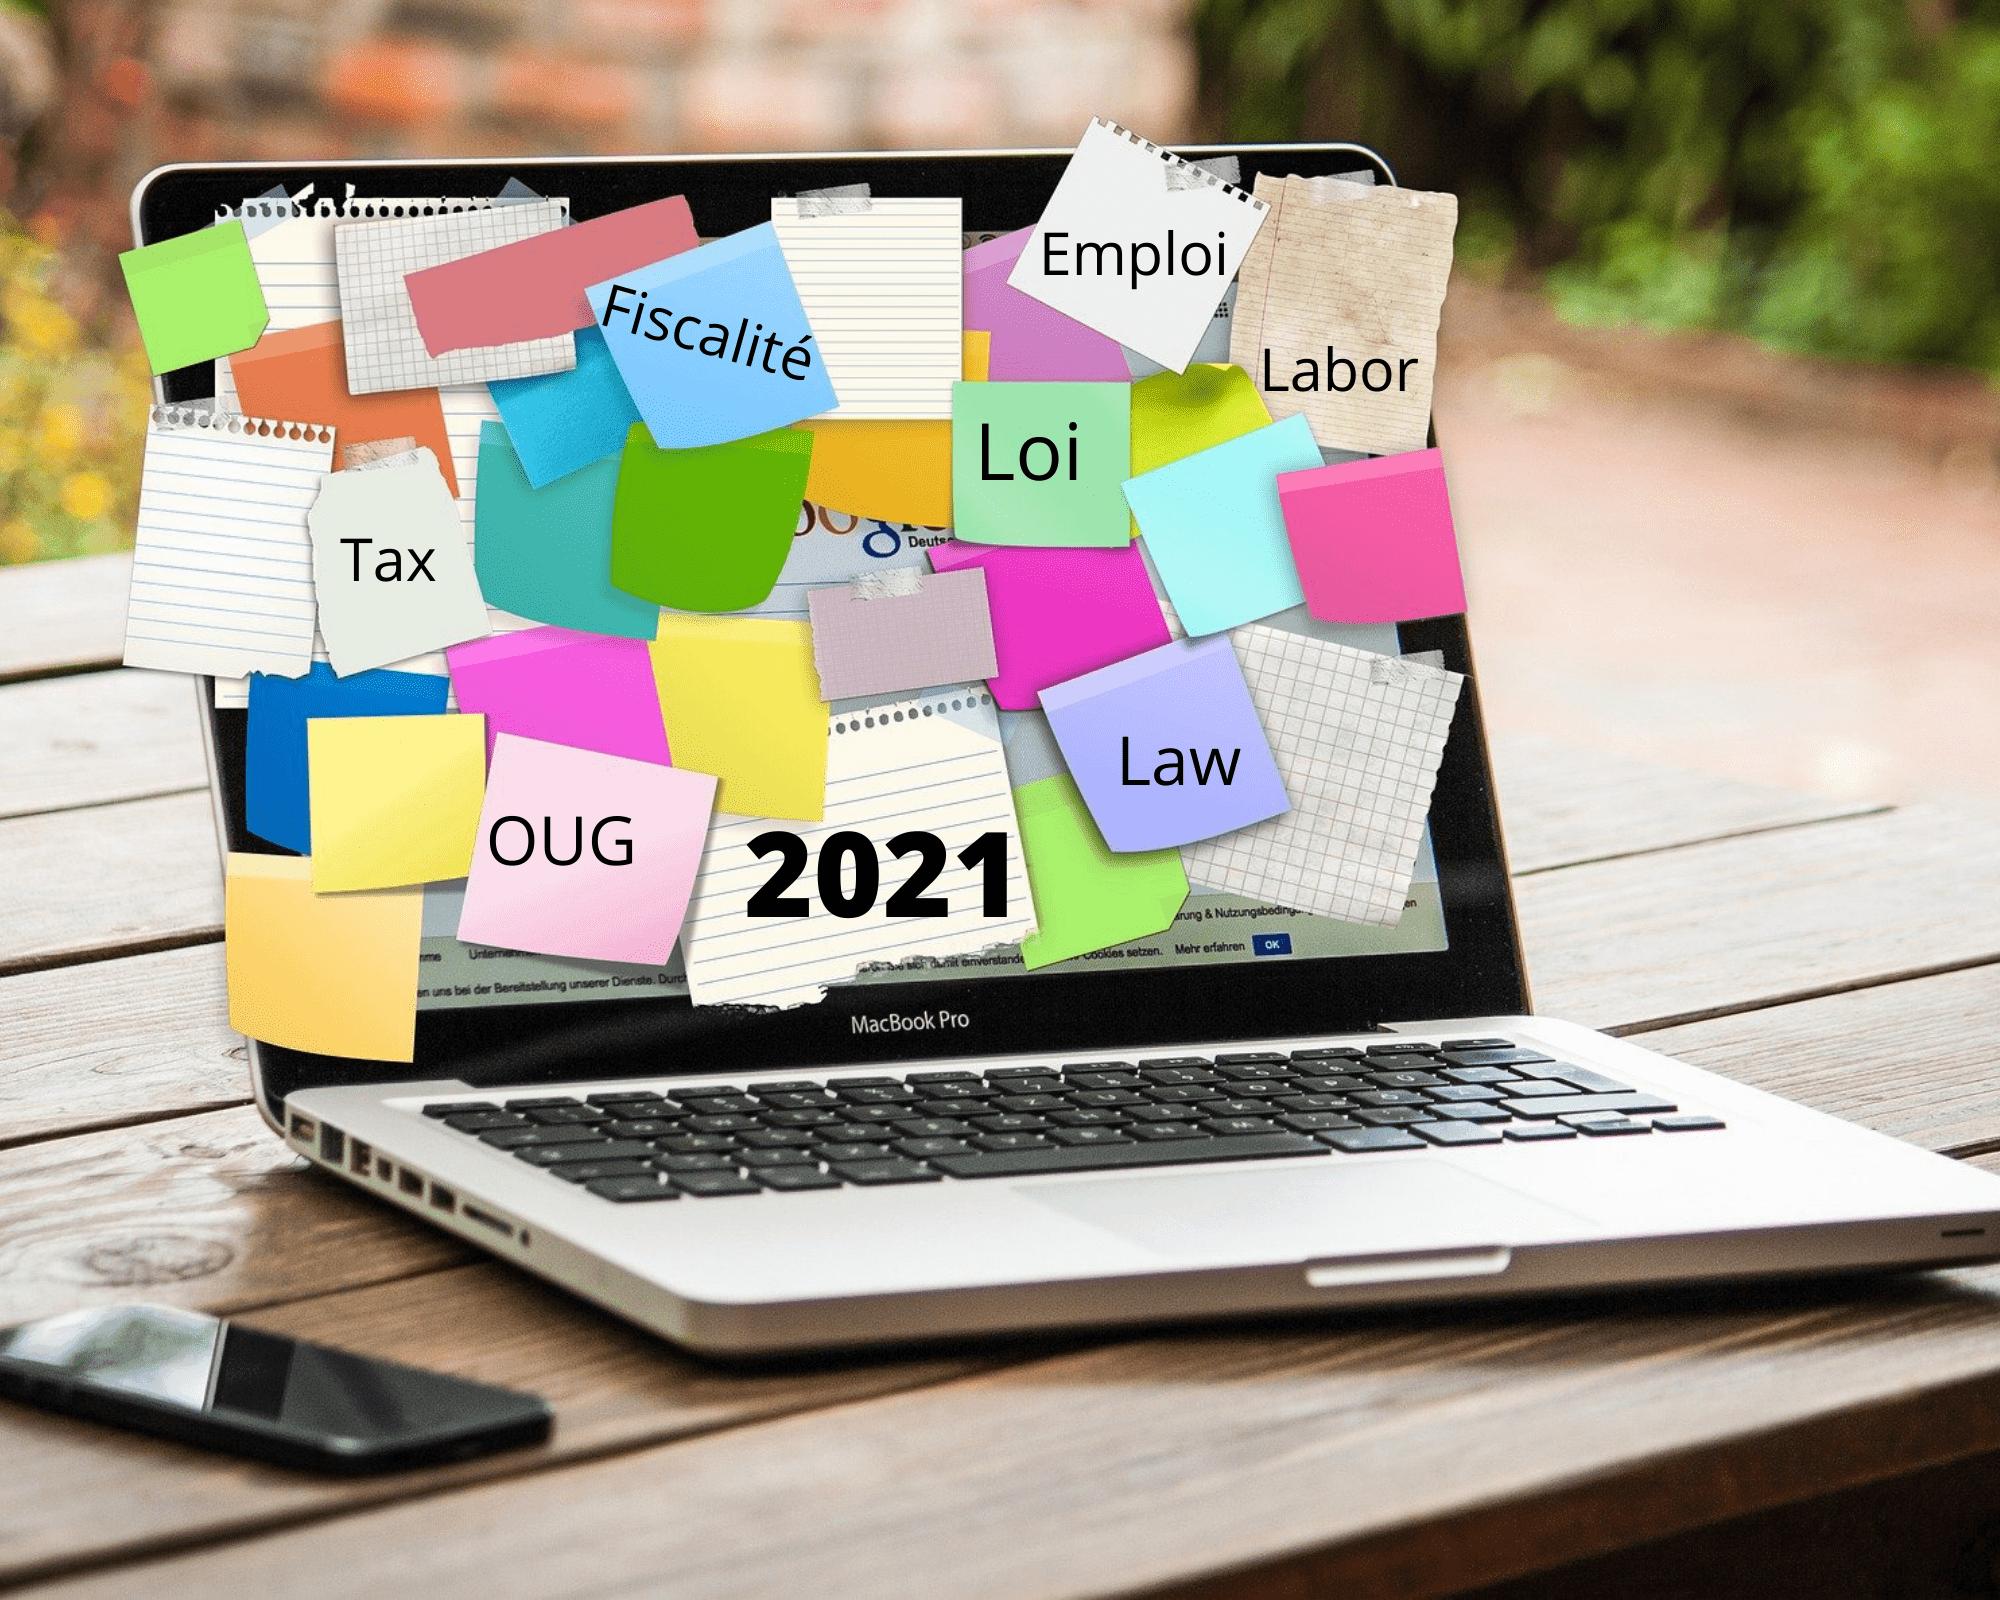 LES PRINCIPALES MODIFICATIONS LEGISLATIVES ET FISCALES EN VIGUEUR EN 2021